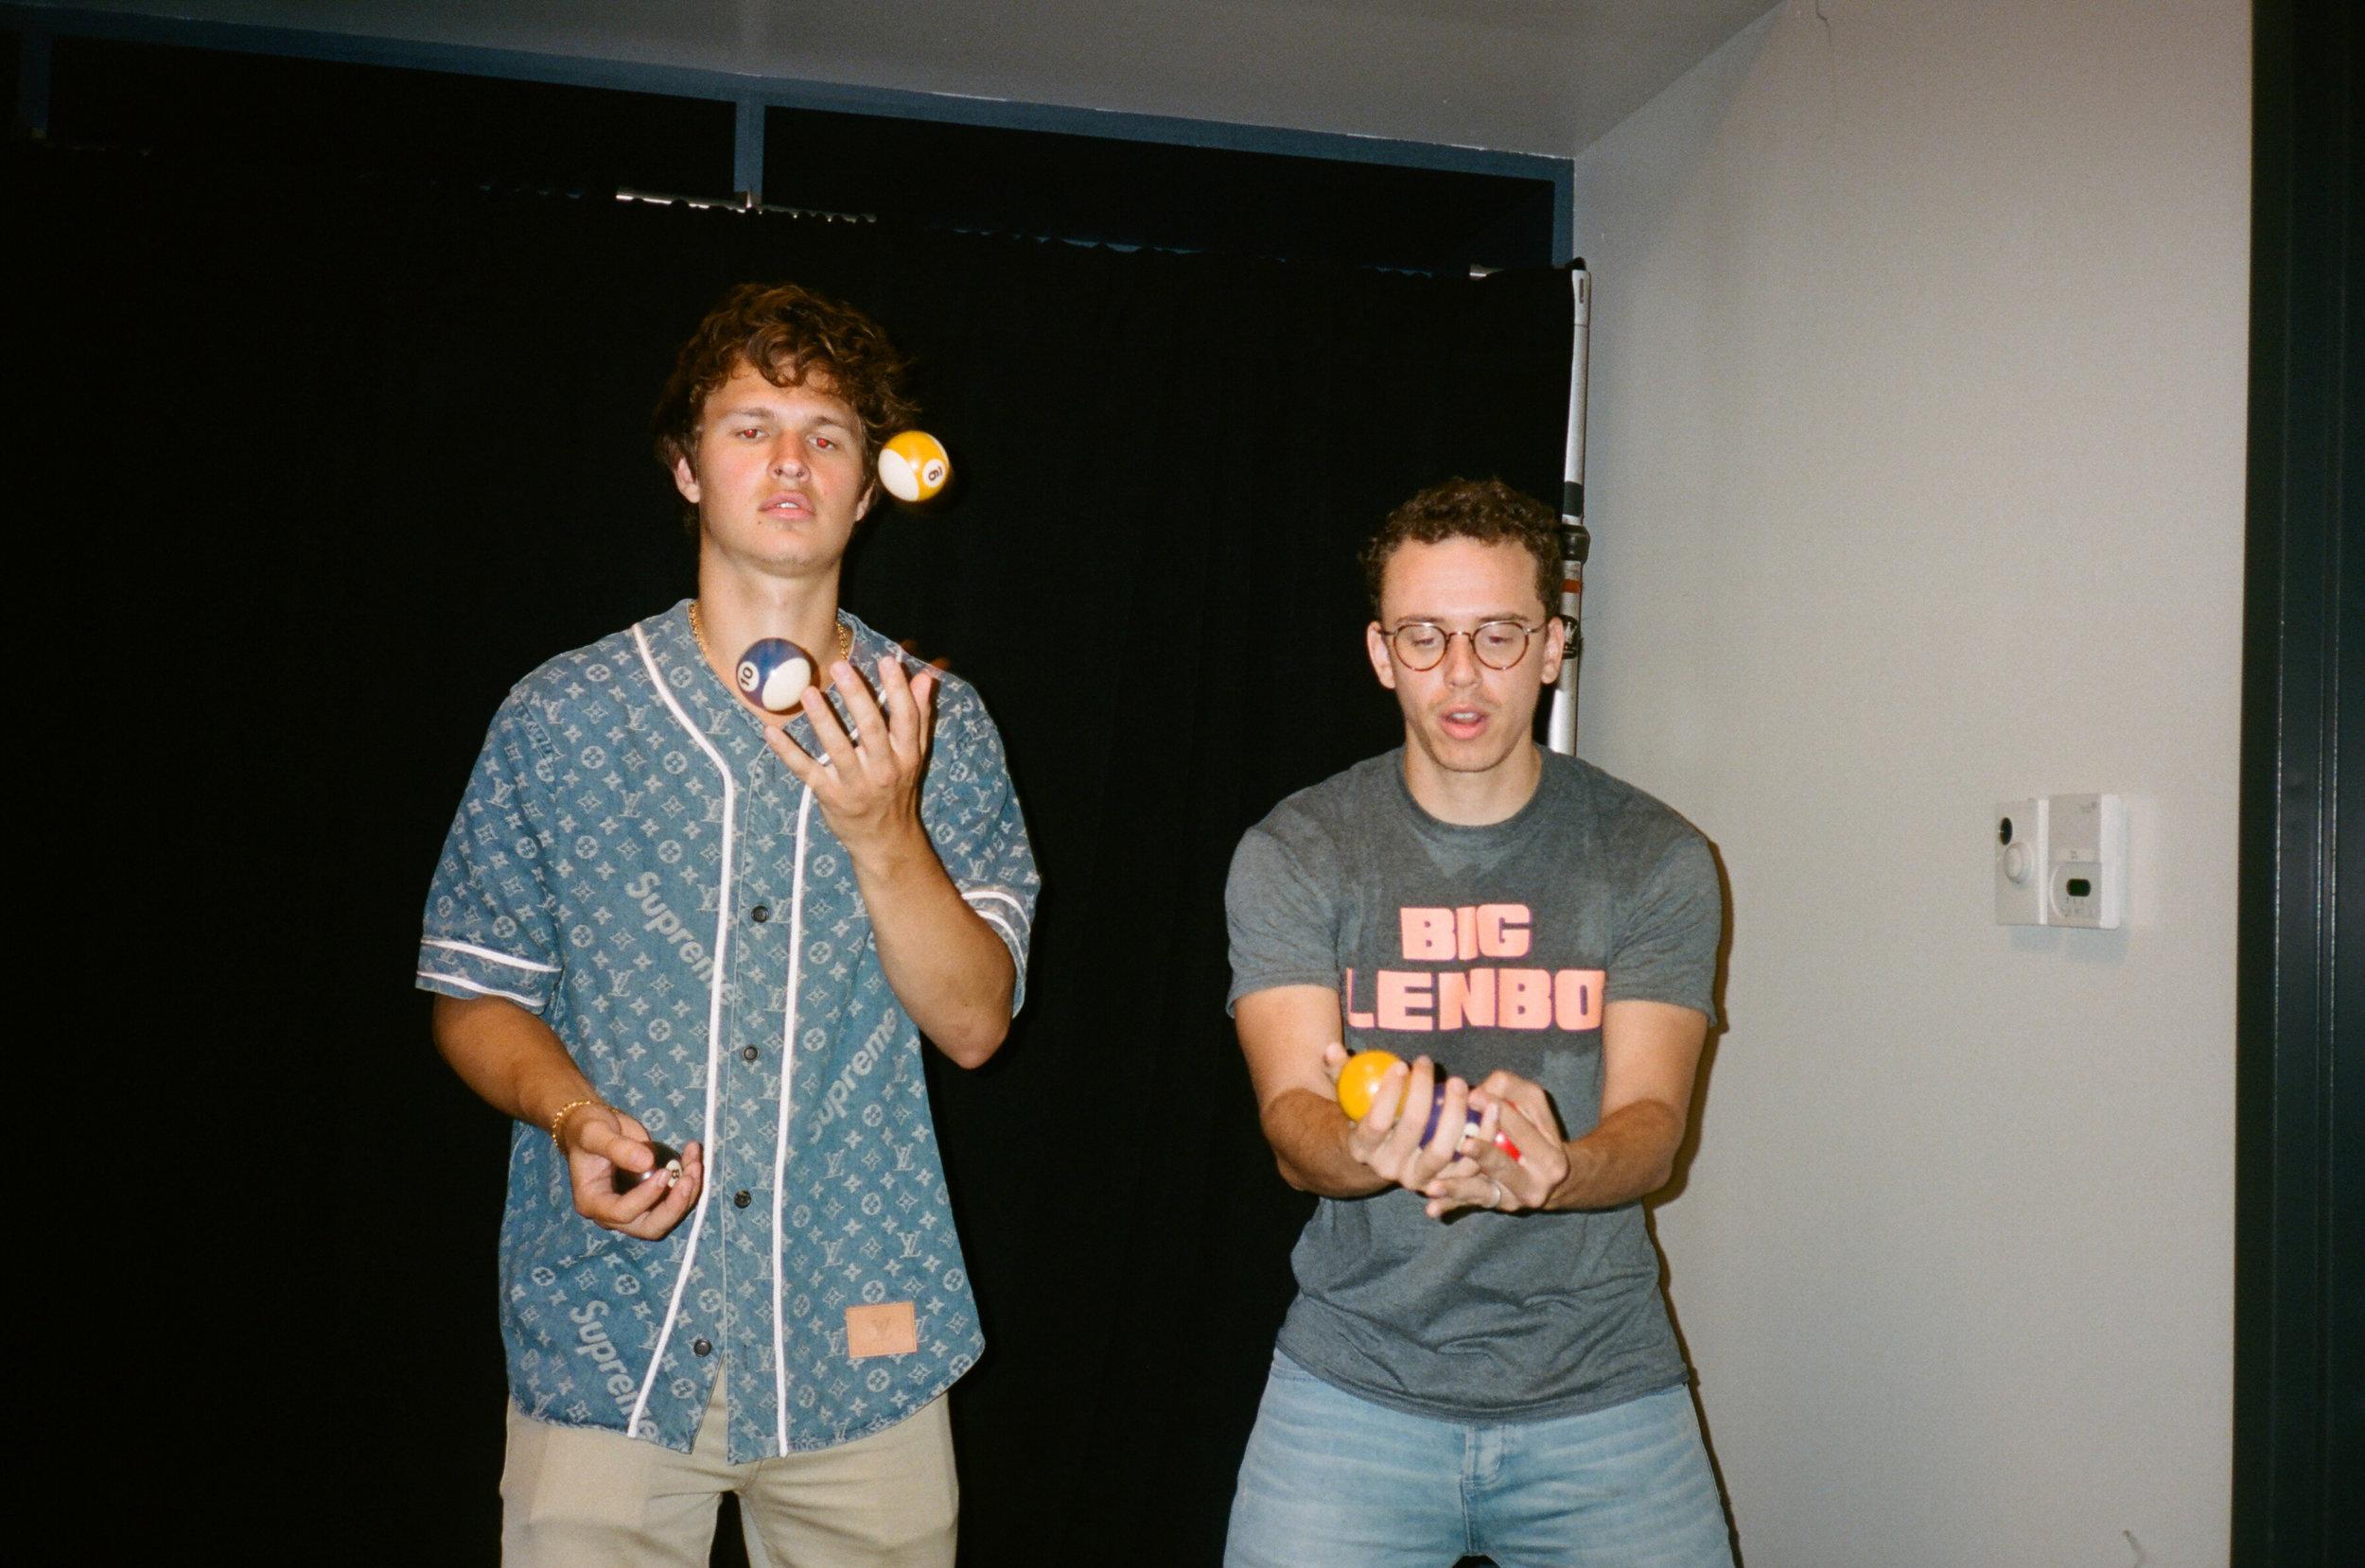 Ansel Elgort and Bob try and juggle pool balls.